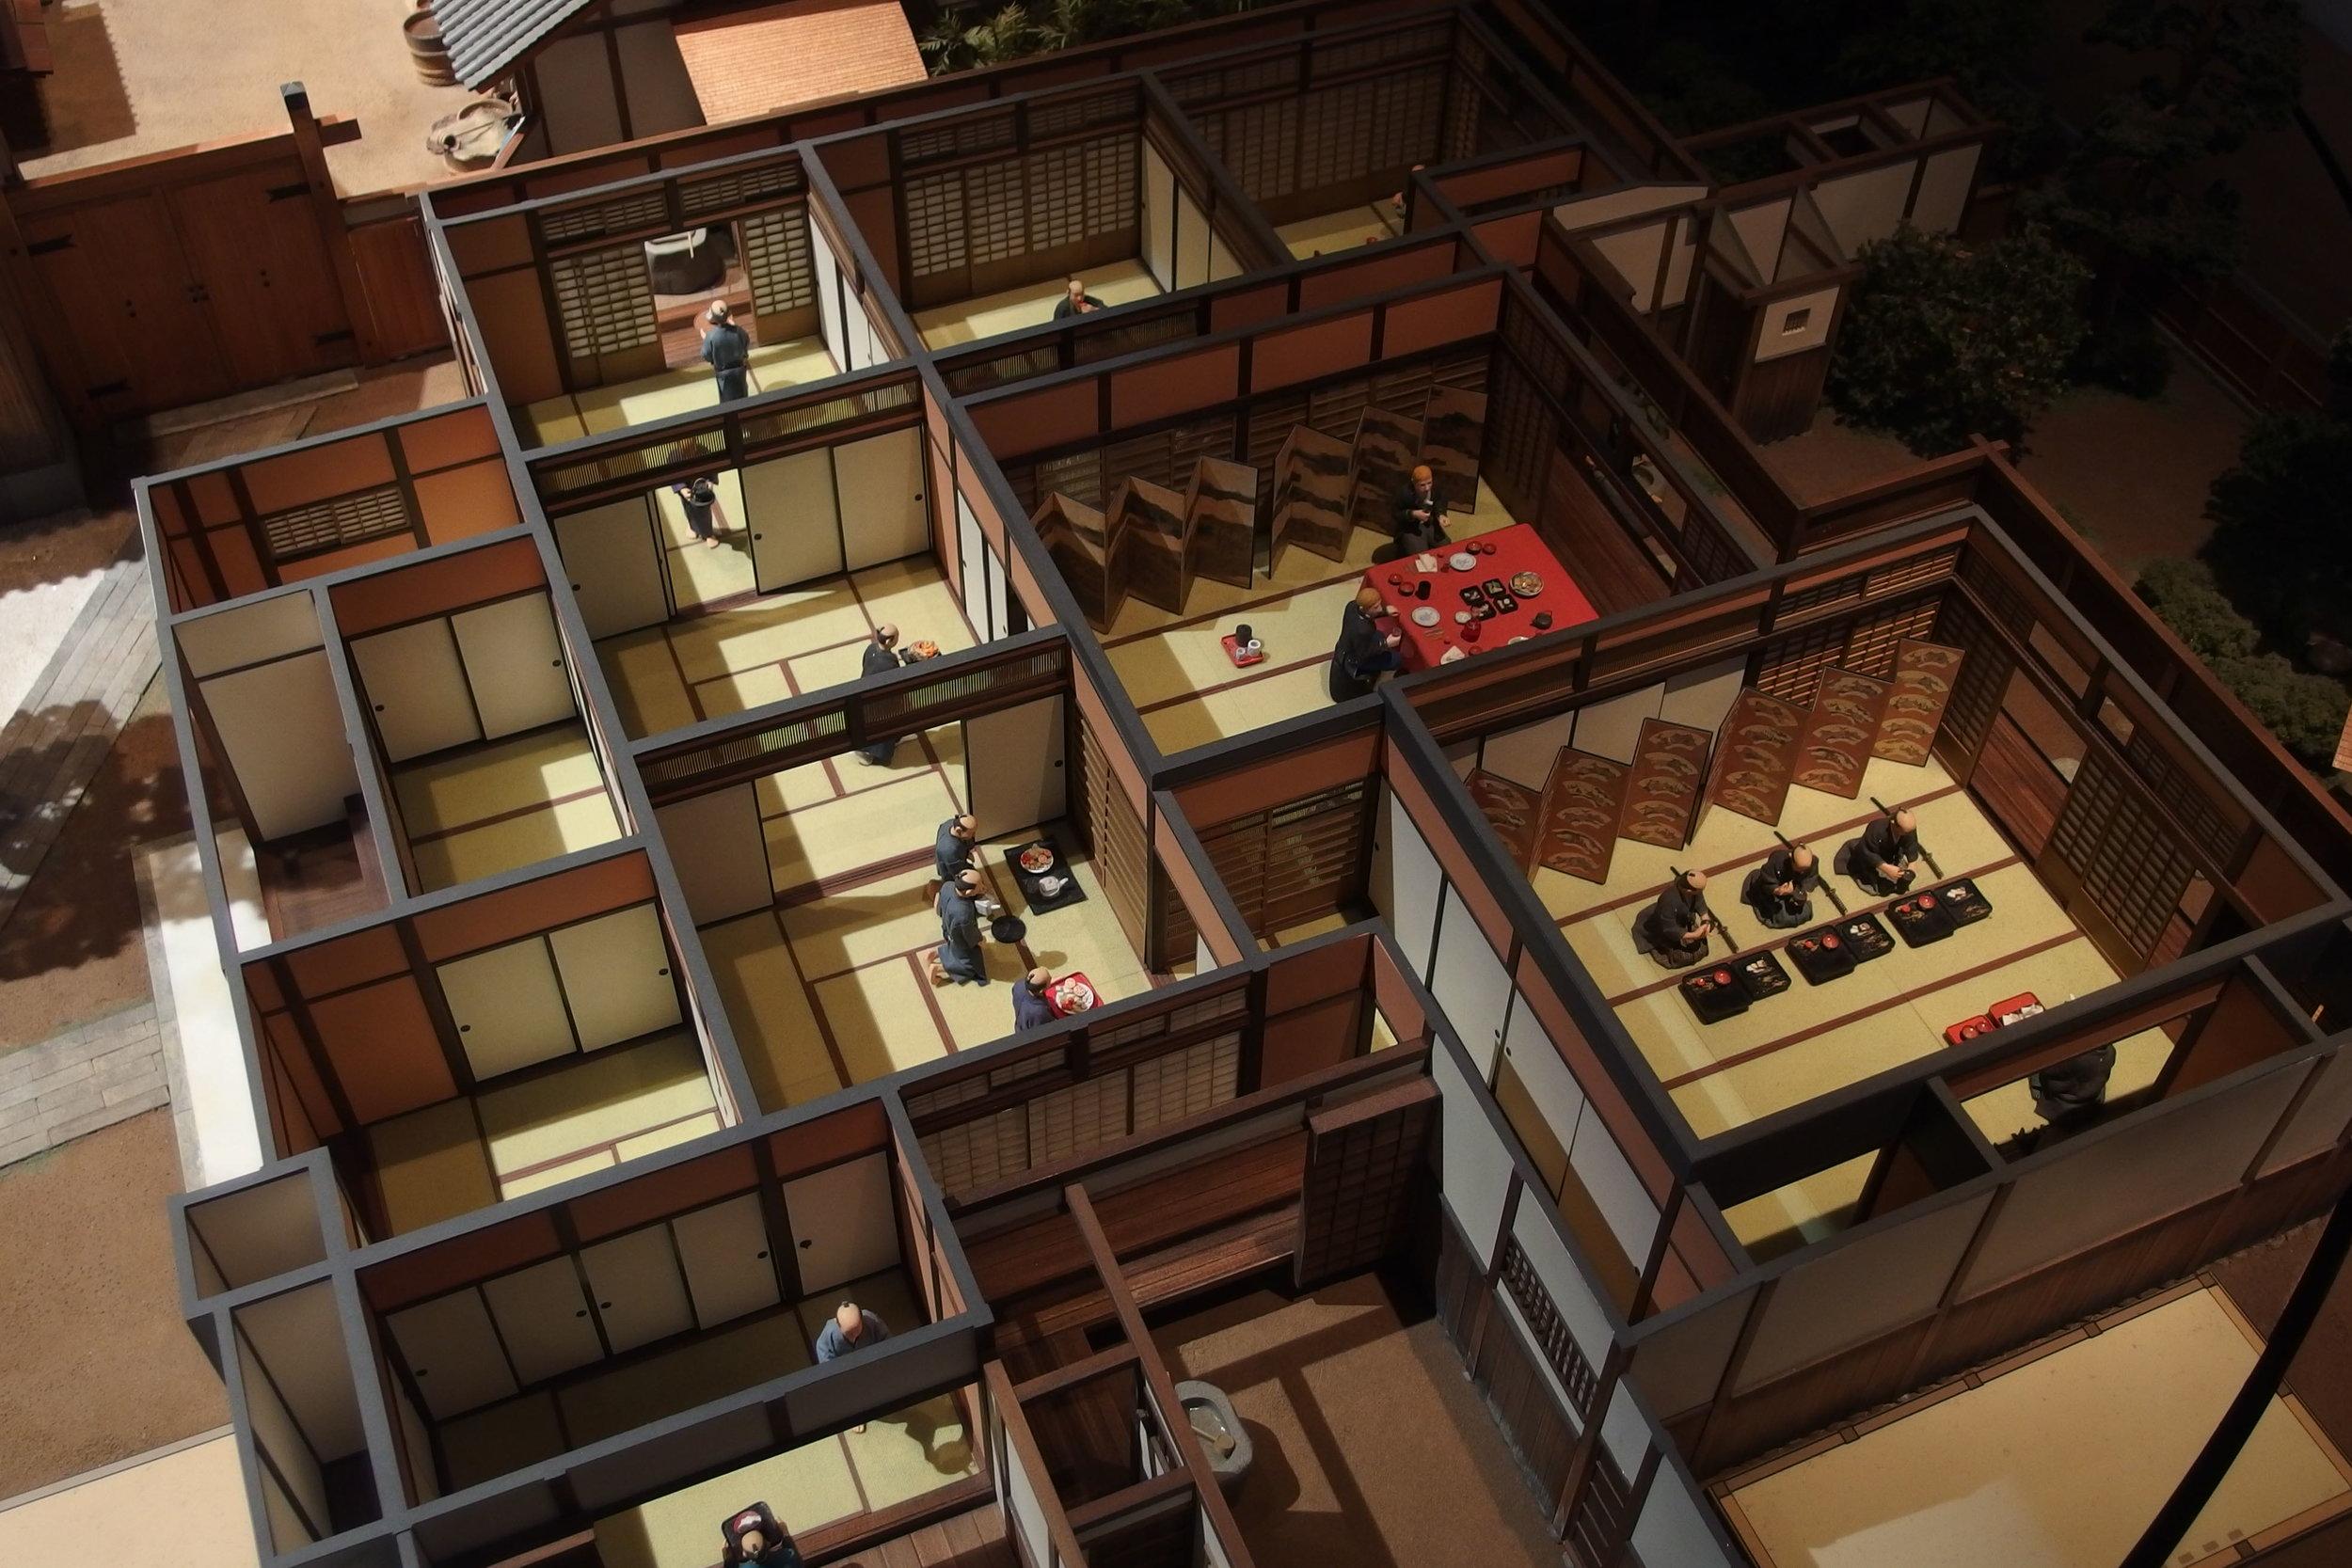 osaka museum of history model tatami mats interior.jpg